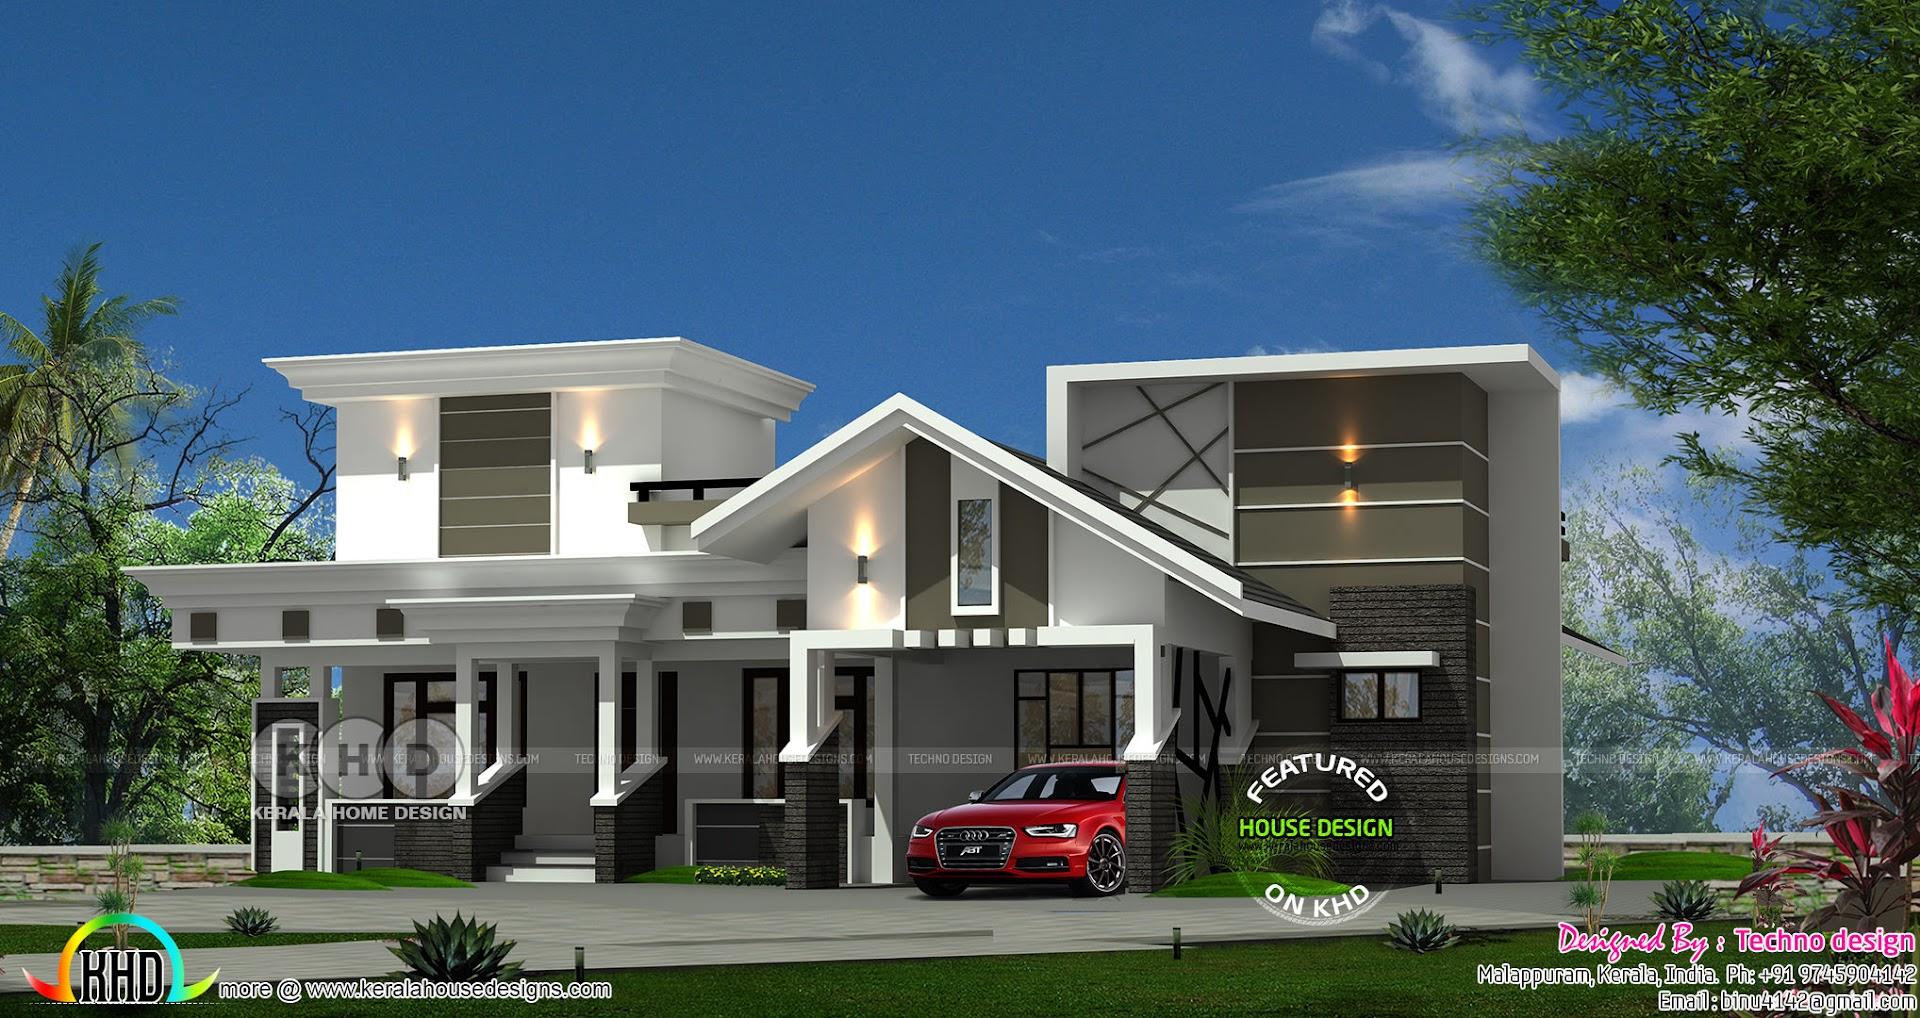 1460 Square Feet 3 Bedroom Single Floor Modern House Kerala Home Design And Floor Plans 8000 Houses